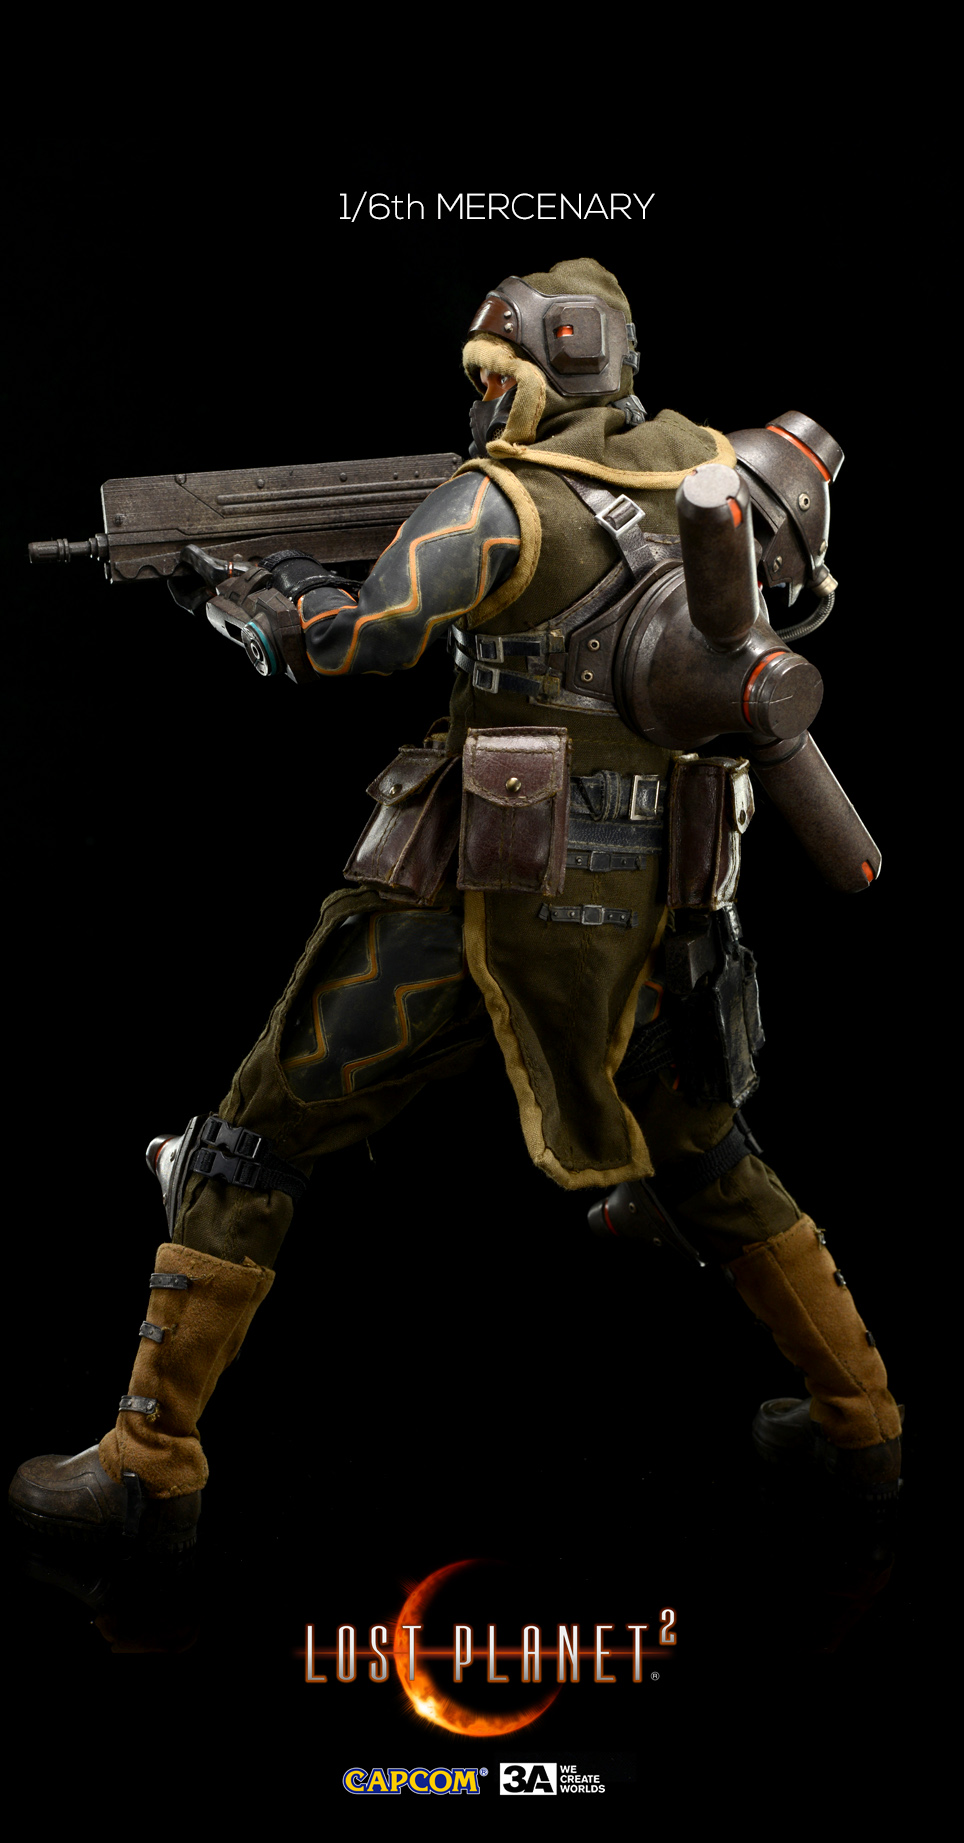 3A-Lost-Planet-Mercenary-video-game-LPM22 1_o.jpg